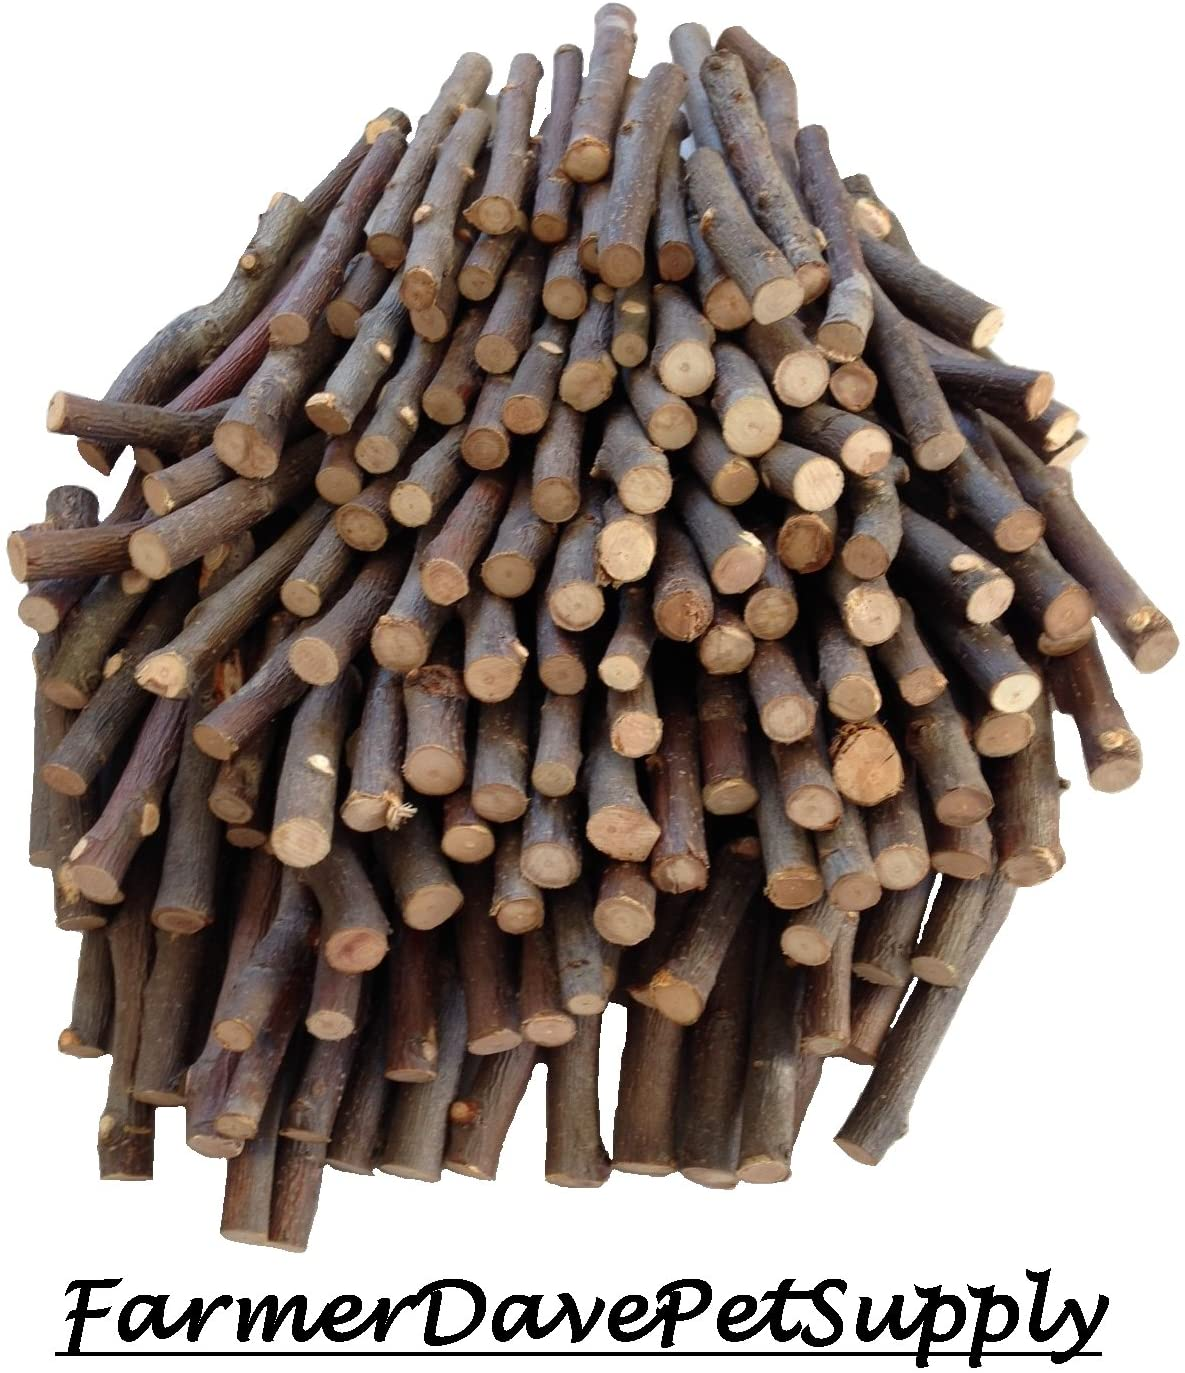 FarmerDavePetSupply 150 Apple Chew Big Stick Bulk Pack for Small Animals